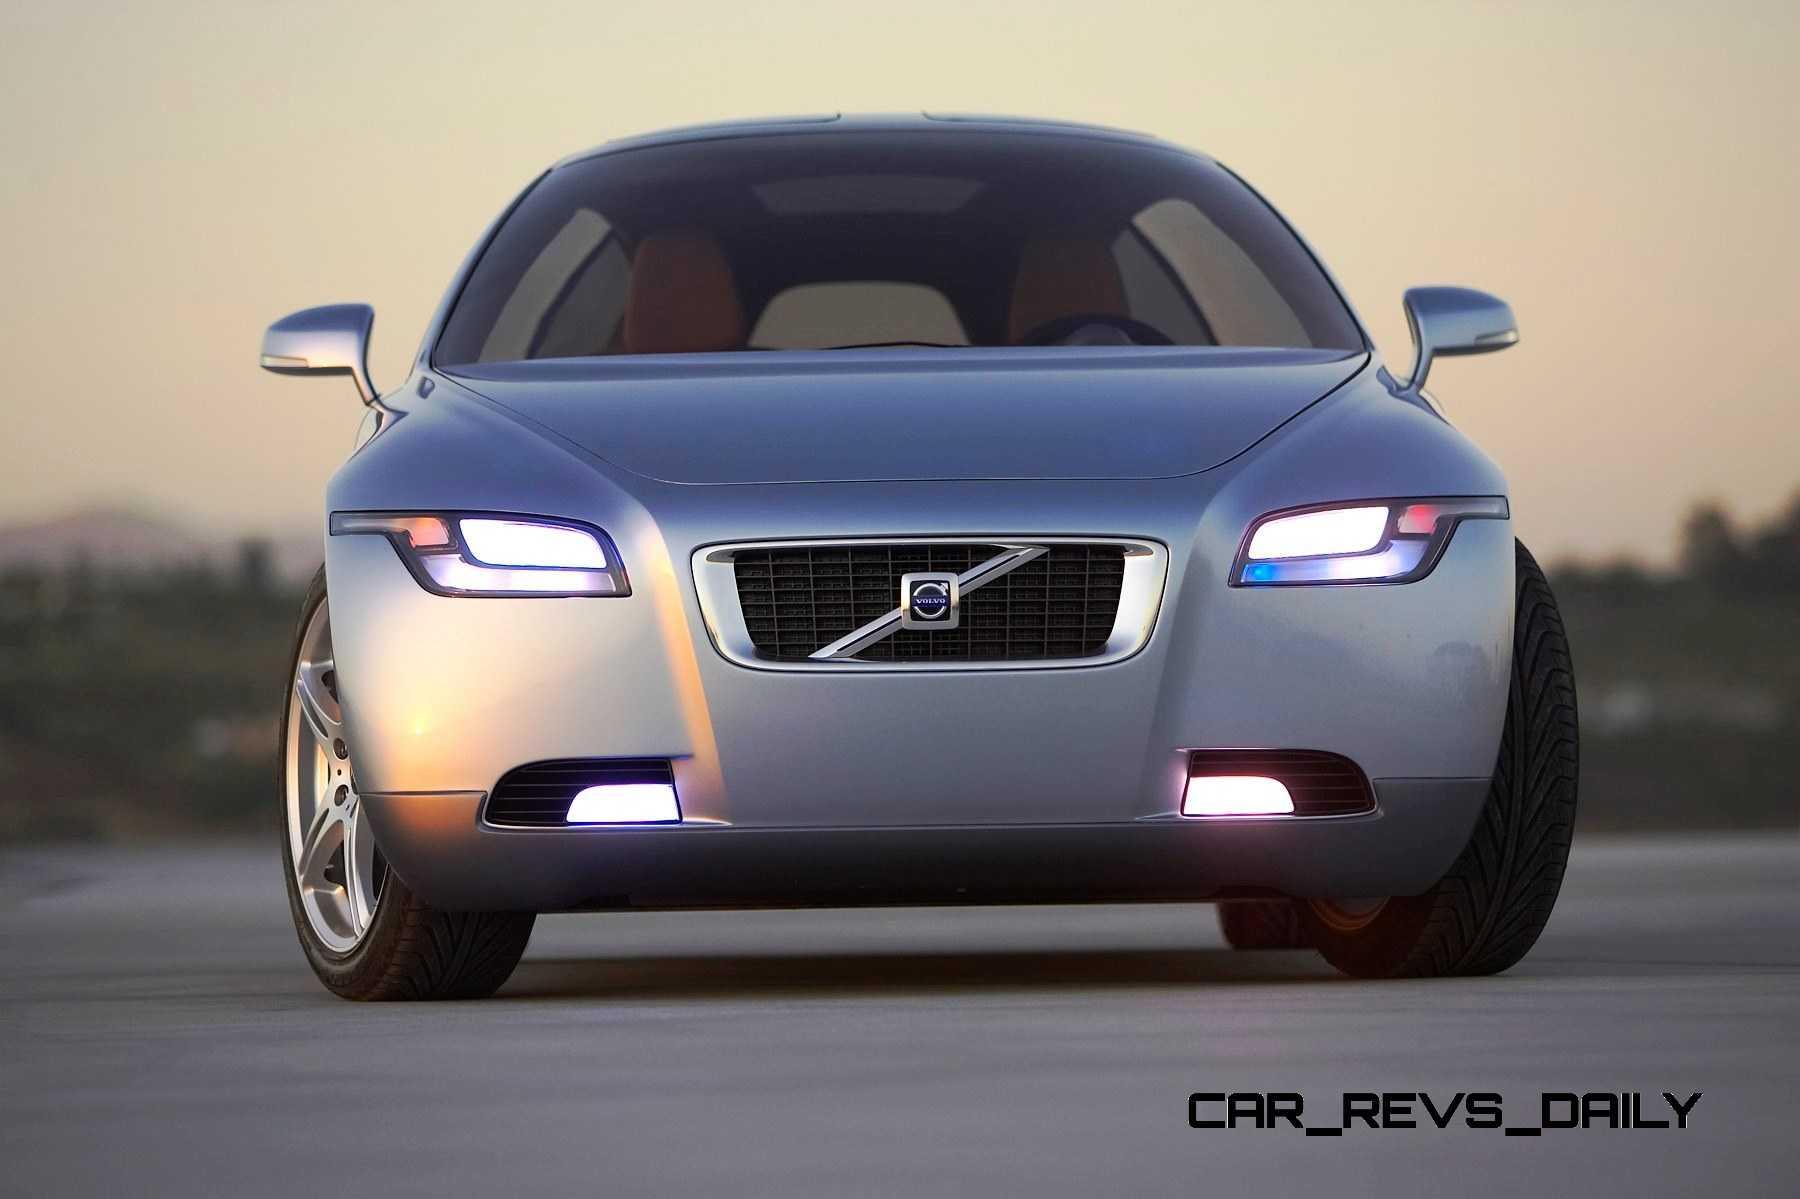 Concept Flashback - 2005 Volvo 3CC